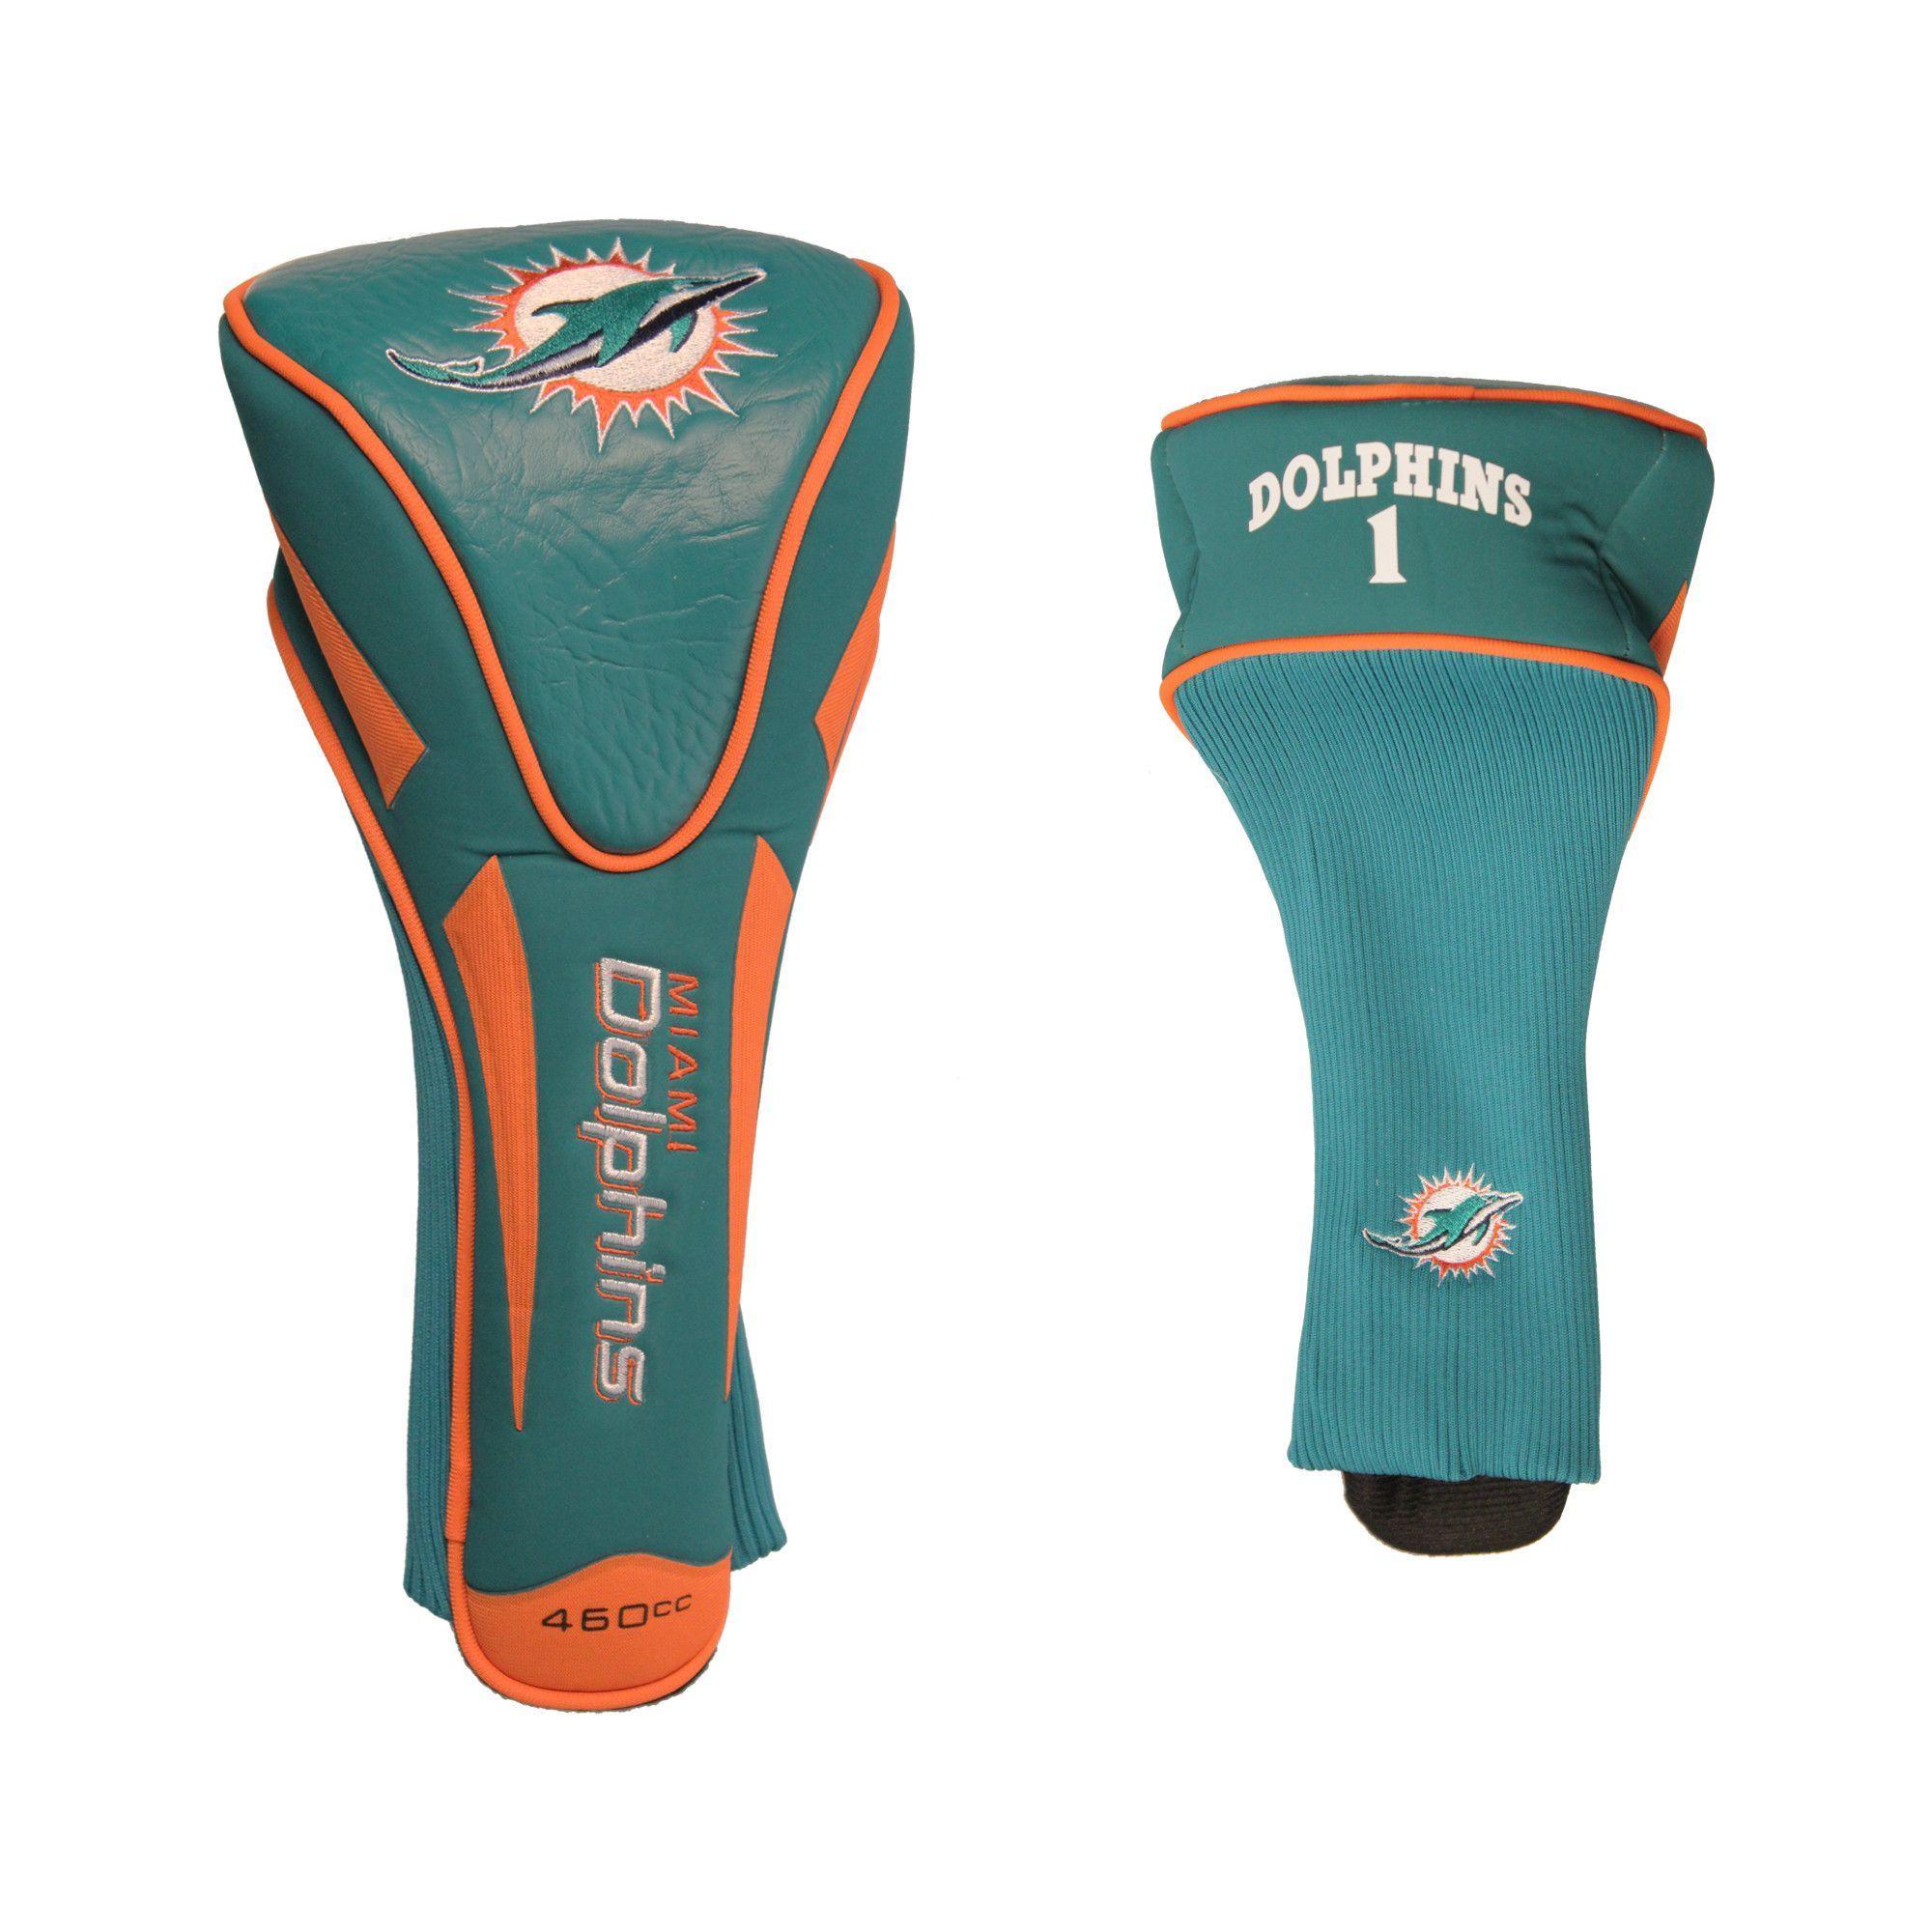 Miami Dolphins Single Apex Jumbo Golf Headcover